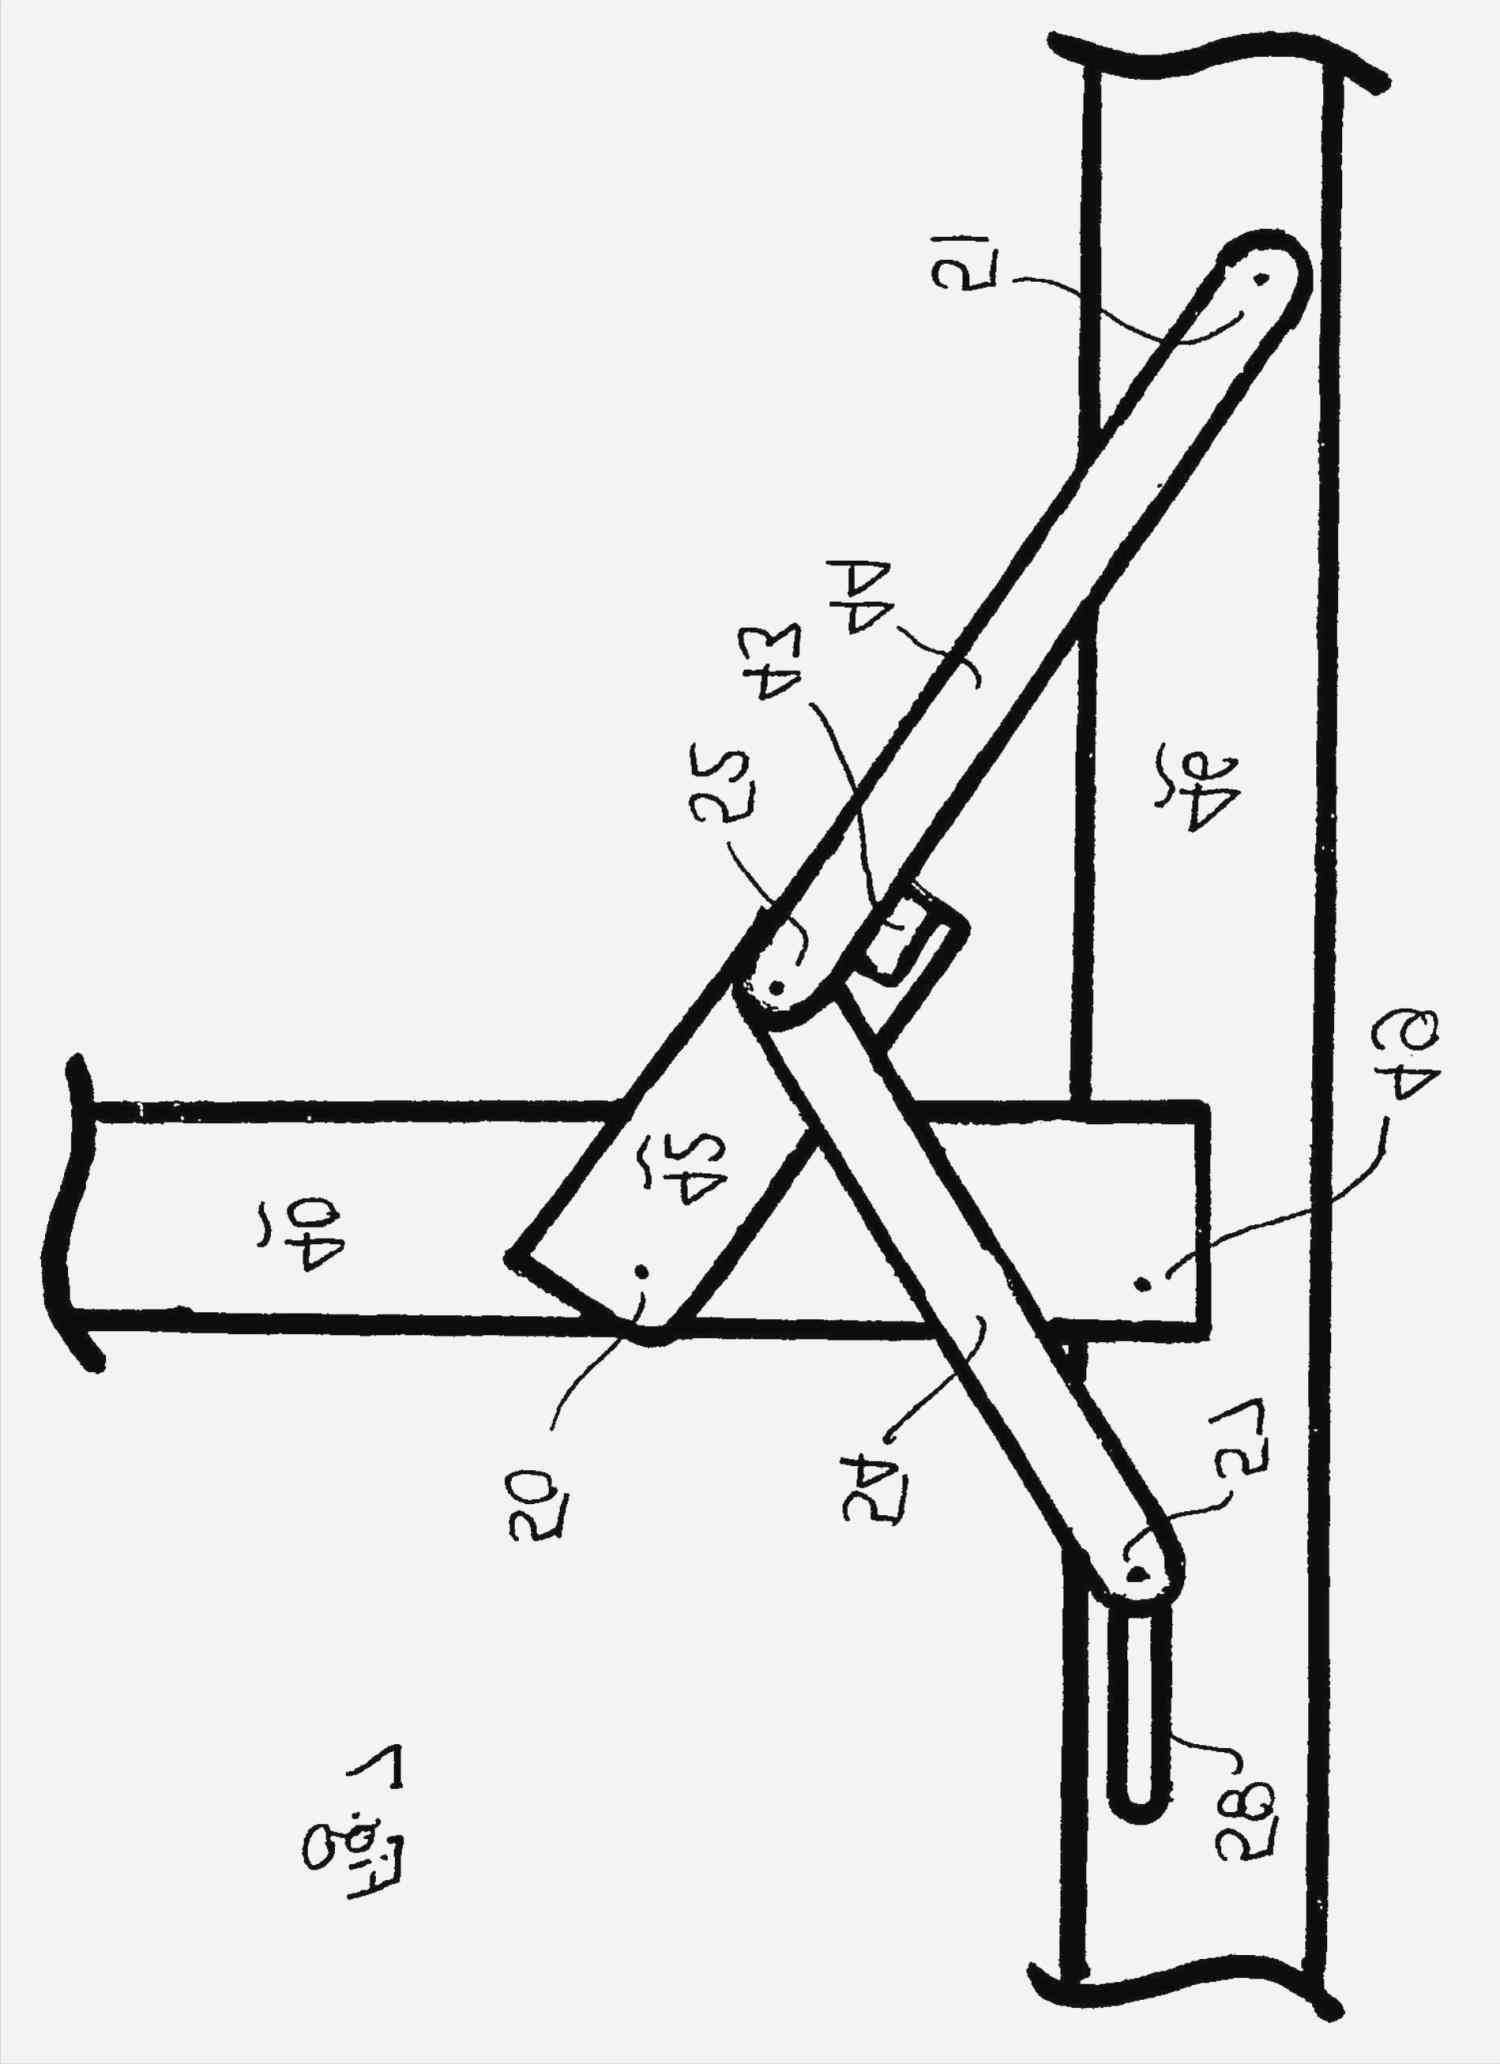 1500x2064 Clipart Quik Shade Walmartcom Quik Beach Chairs Drawing Shade